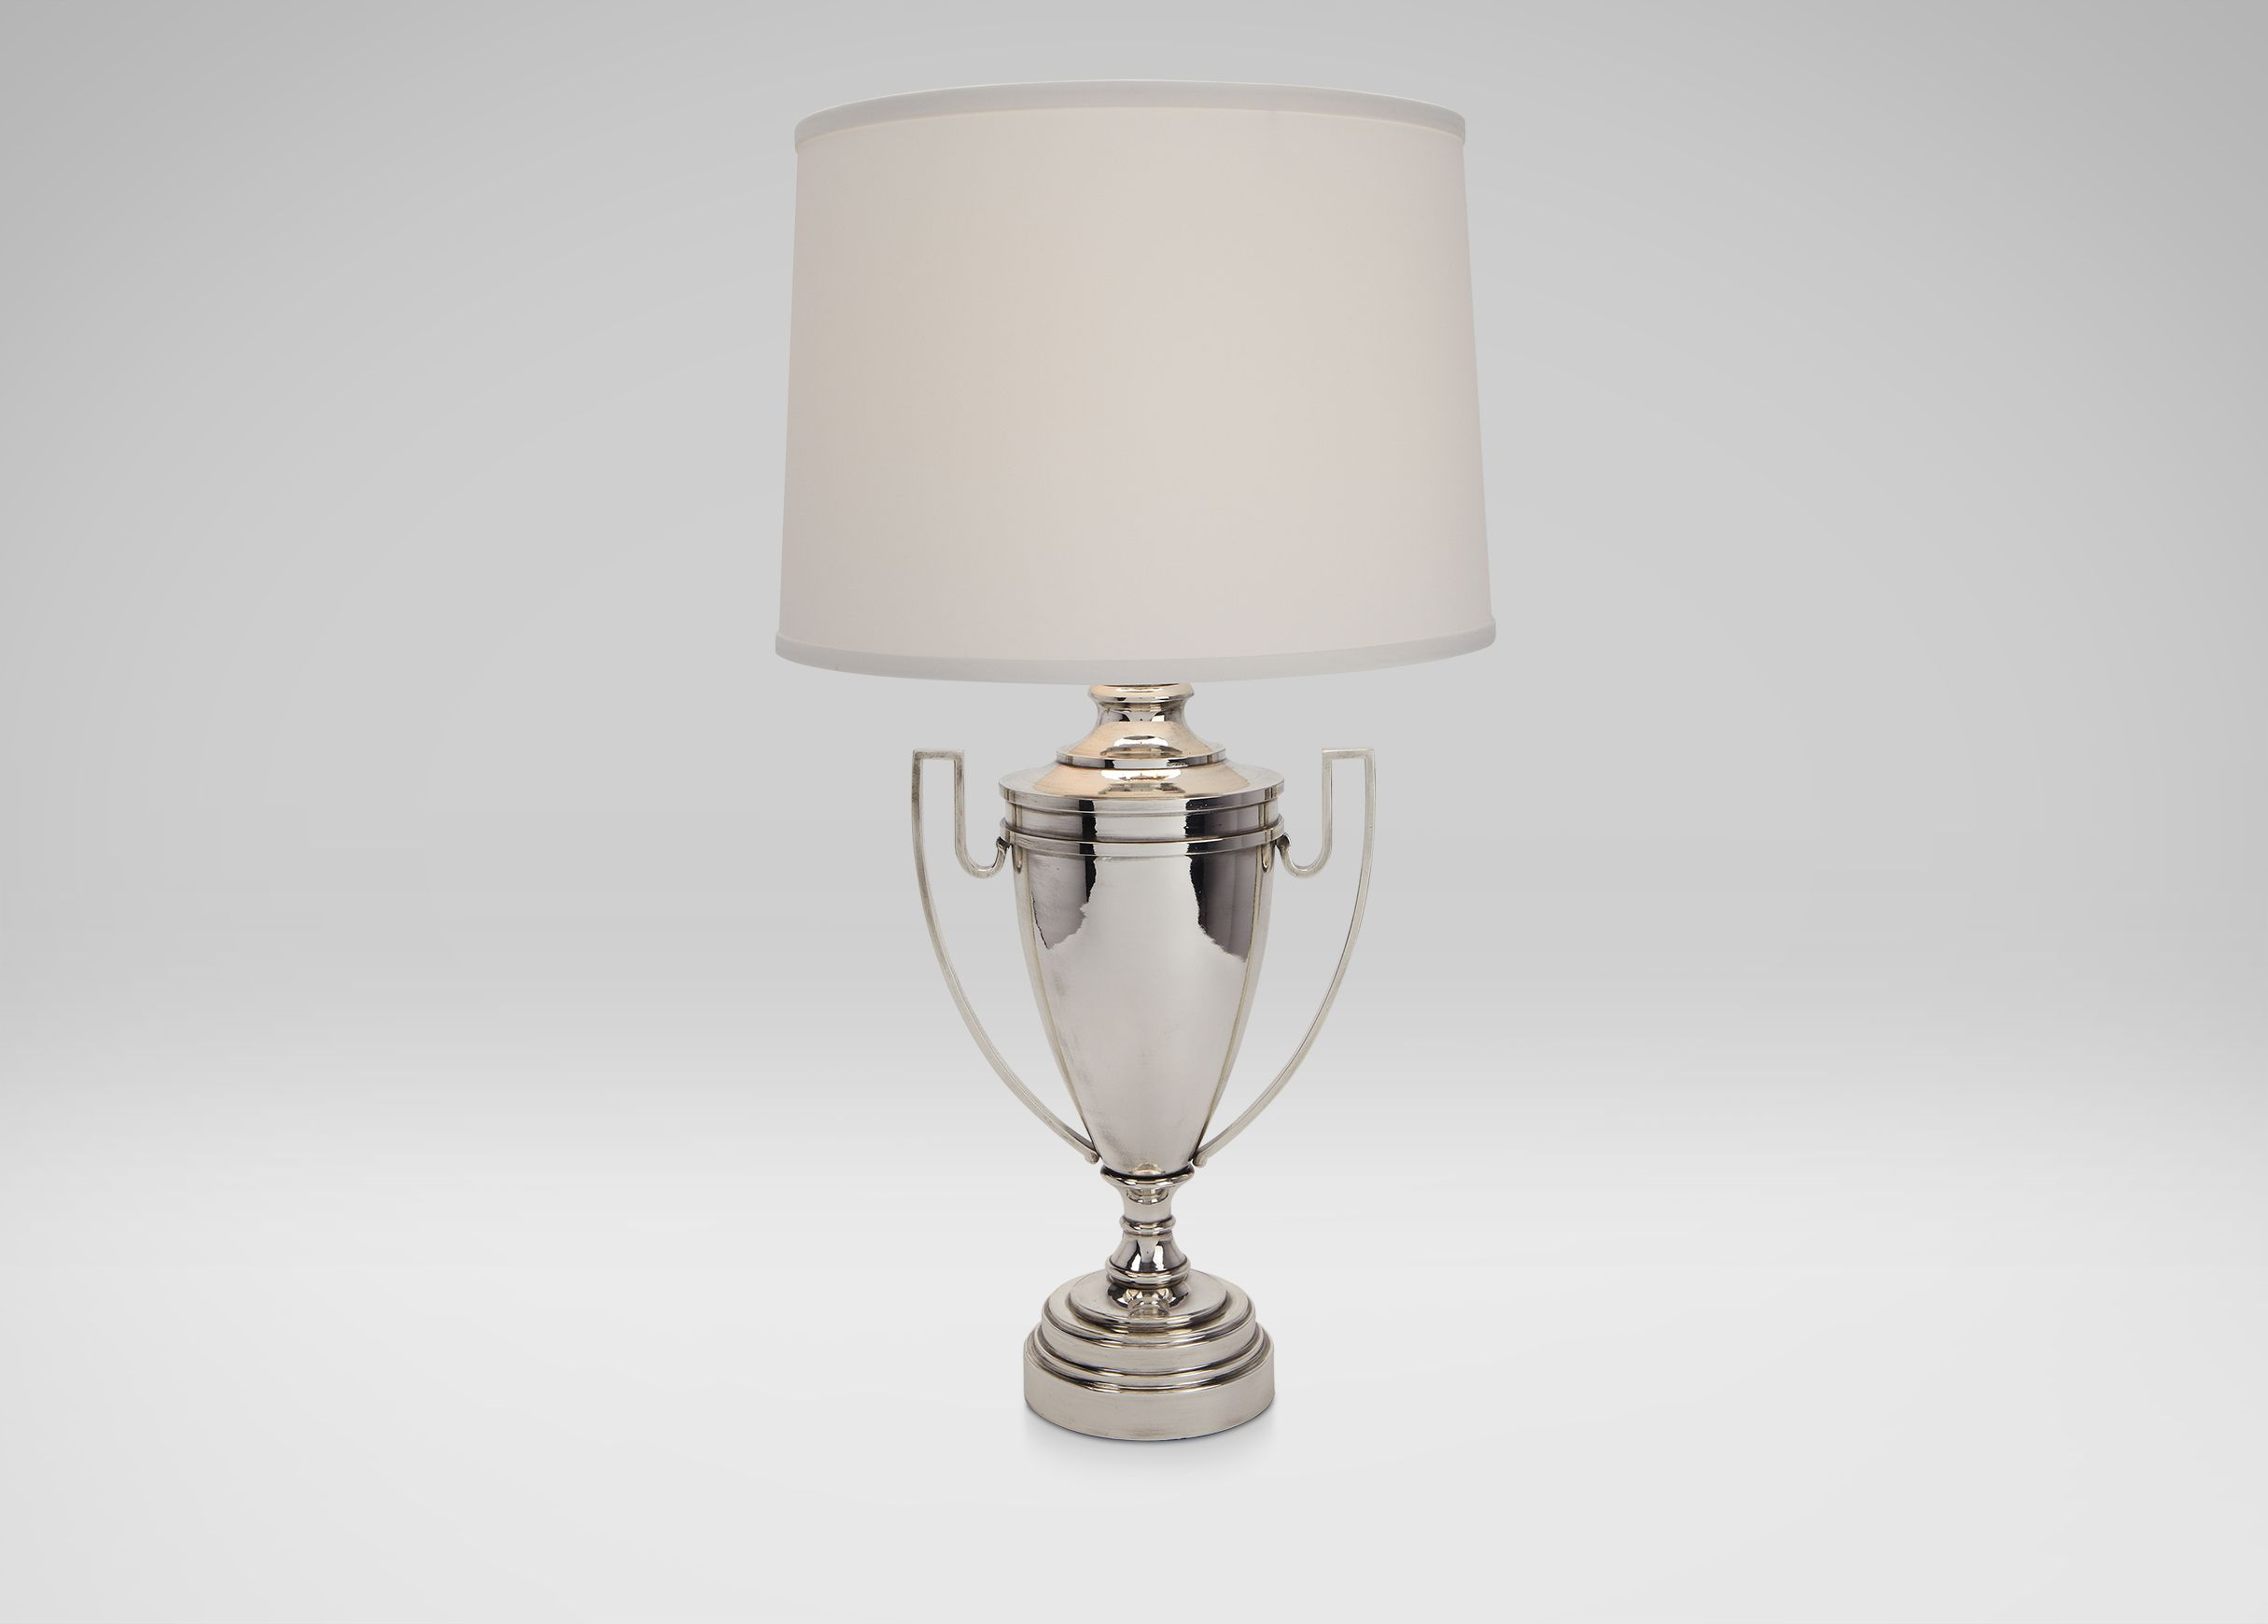 Huntsman Silver Trophy Lamp   Ethan Allen. Huntsman Silver Trophy Lamp   Ethan Allen   Living room